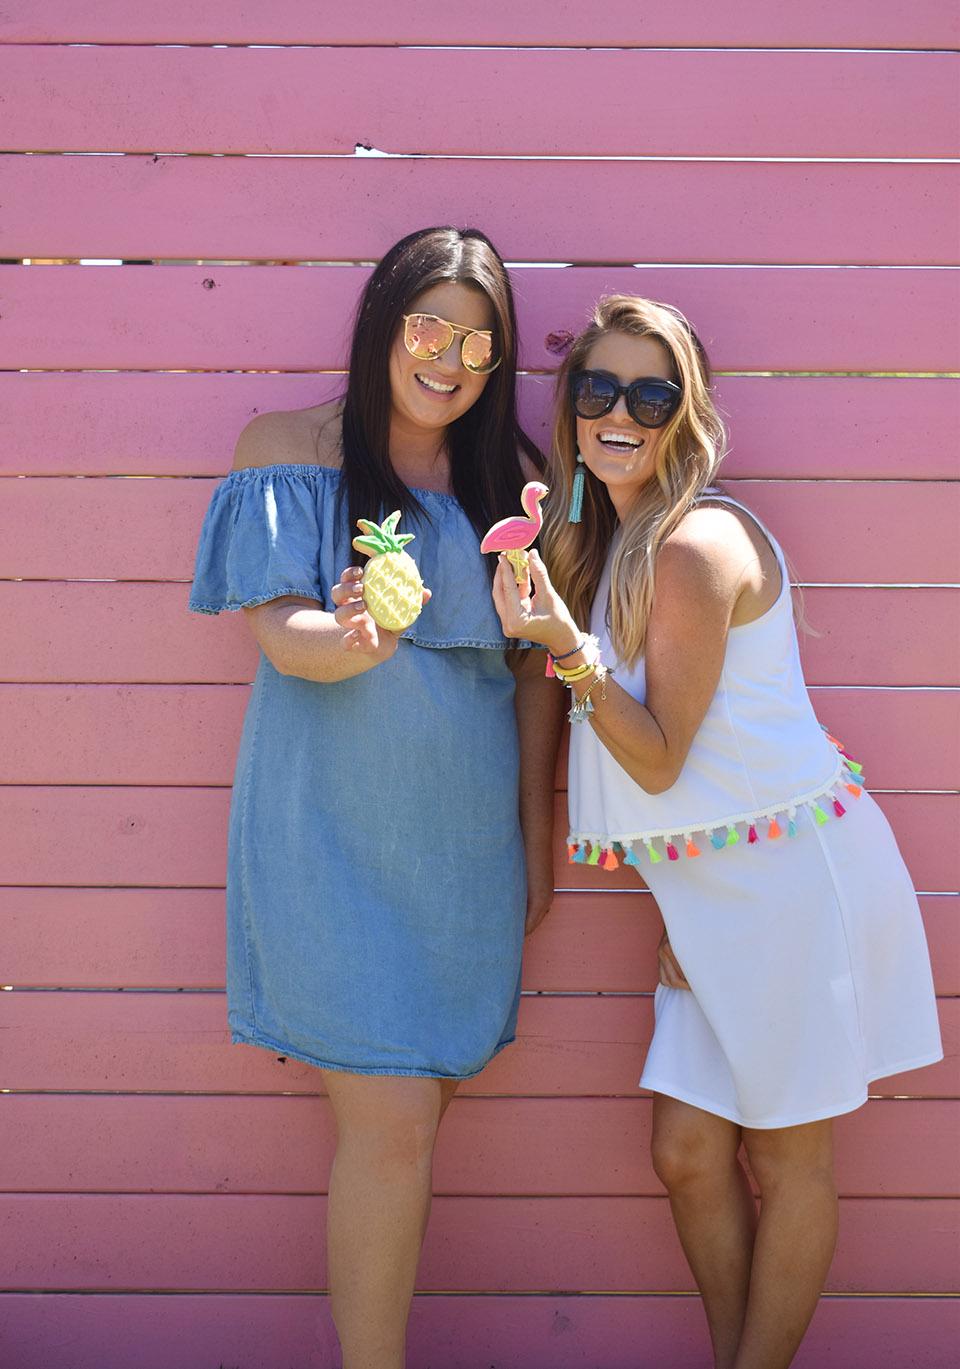 6th Birthday Flamingle - Jami Ray Jessica Fay Pink Wall Pineapple Flamingo Cookies